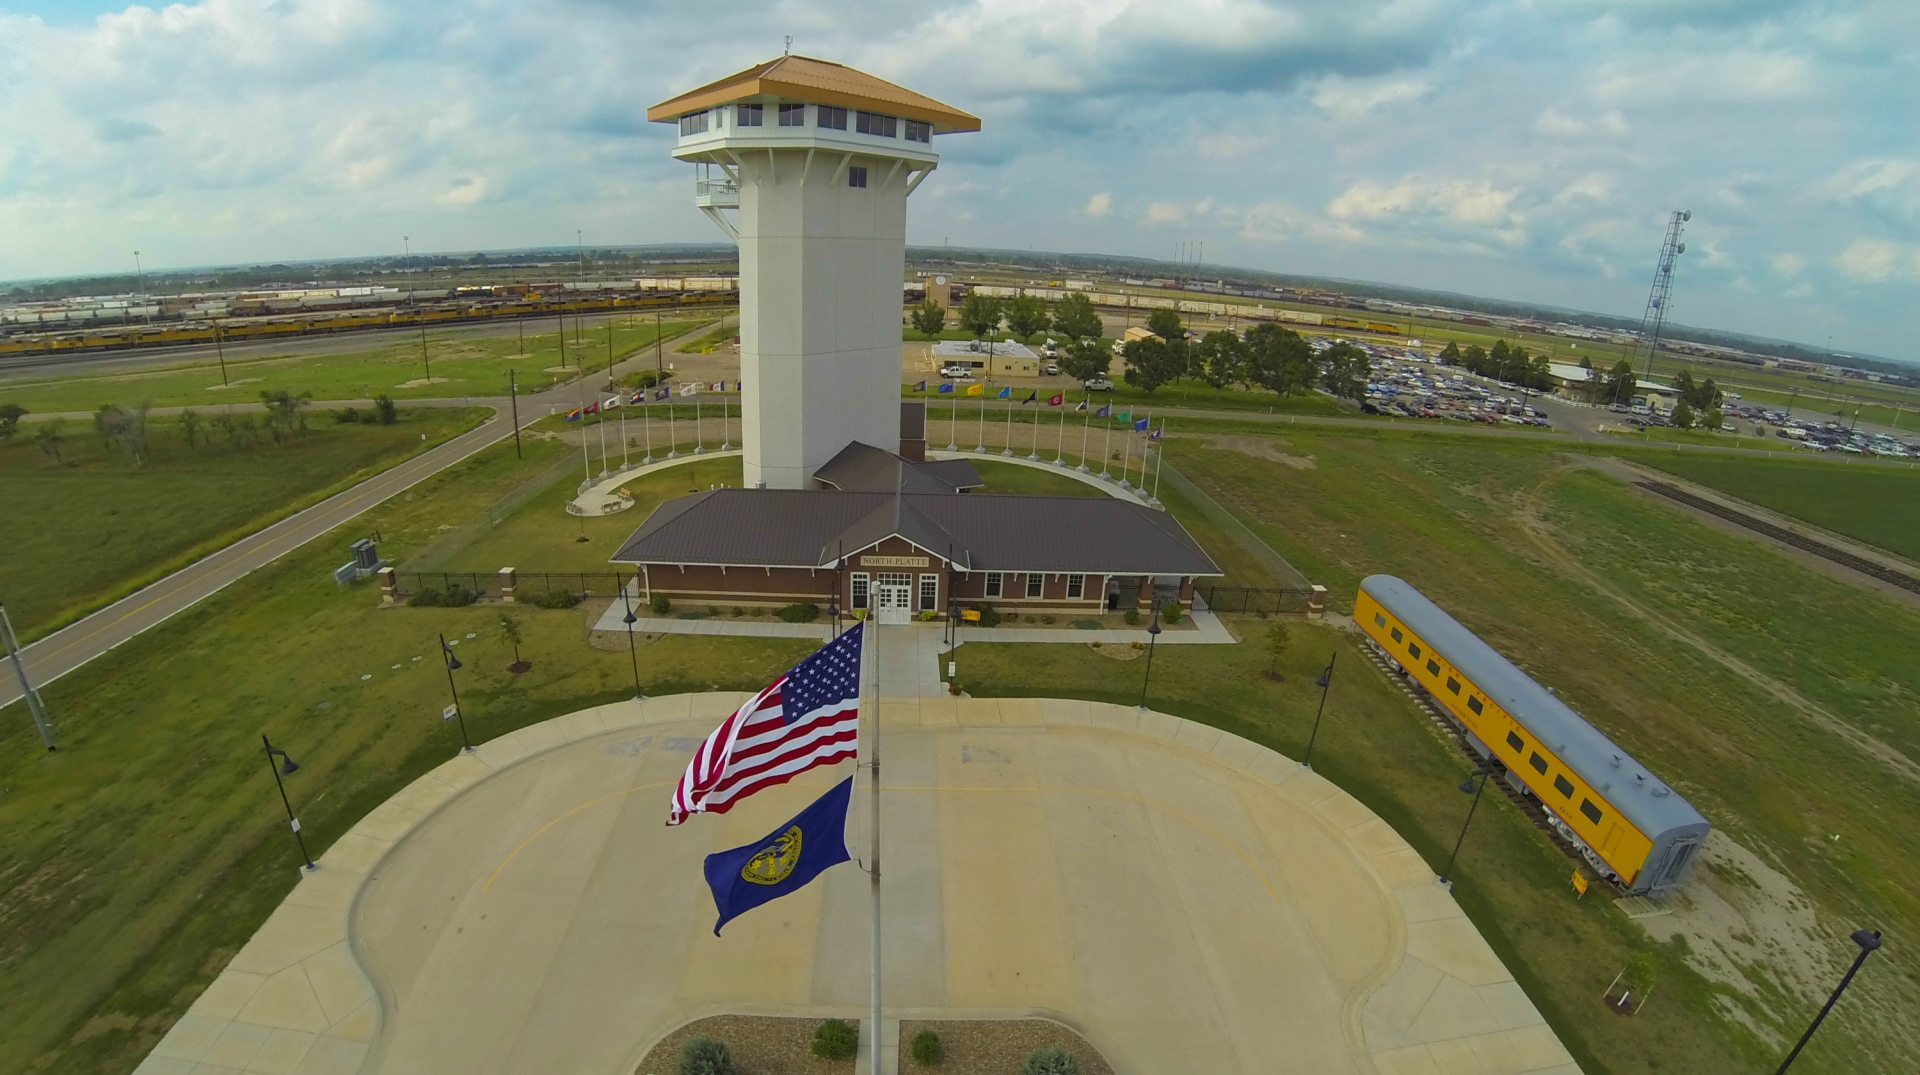 golden spike tower, union pacific railroad, bailey yards, trains, visit north platte, north platte, nebraska, ne